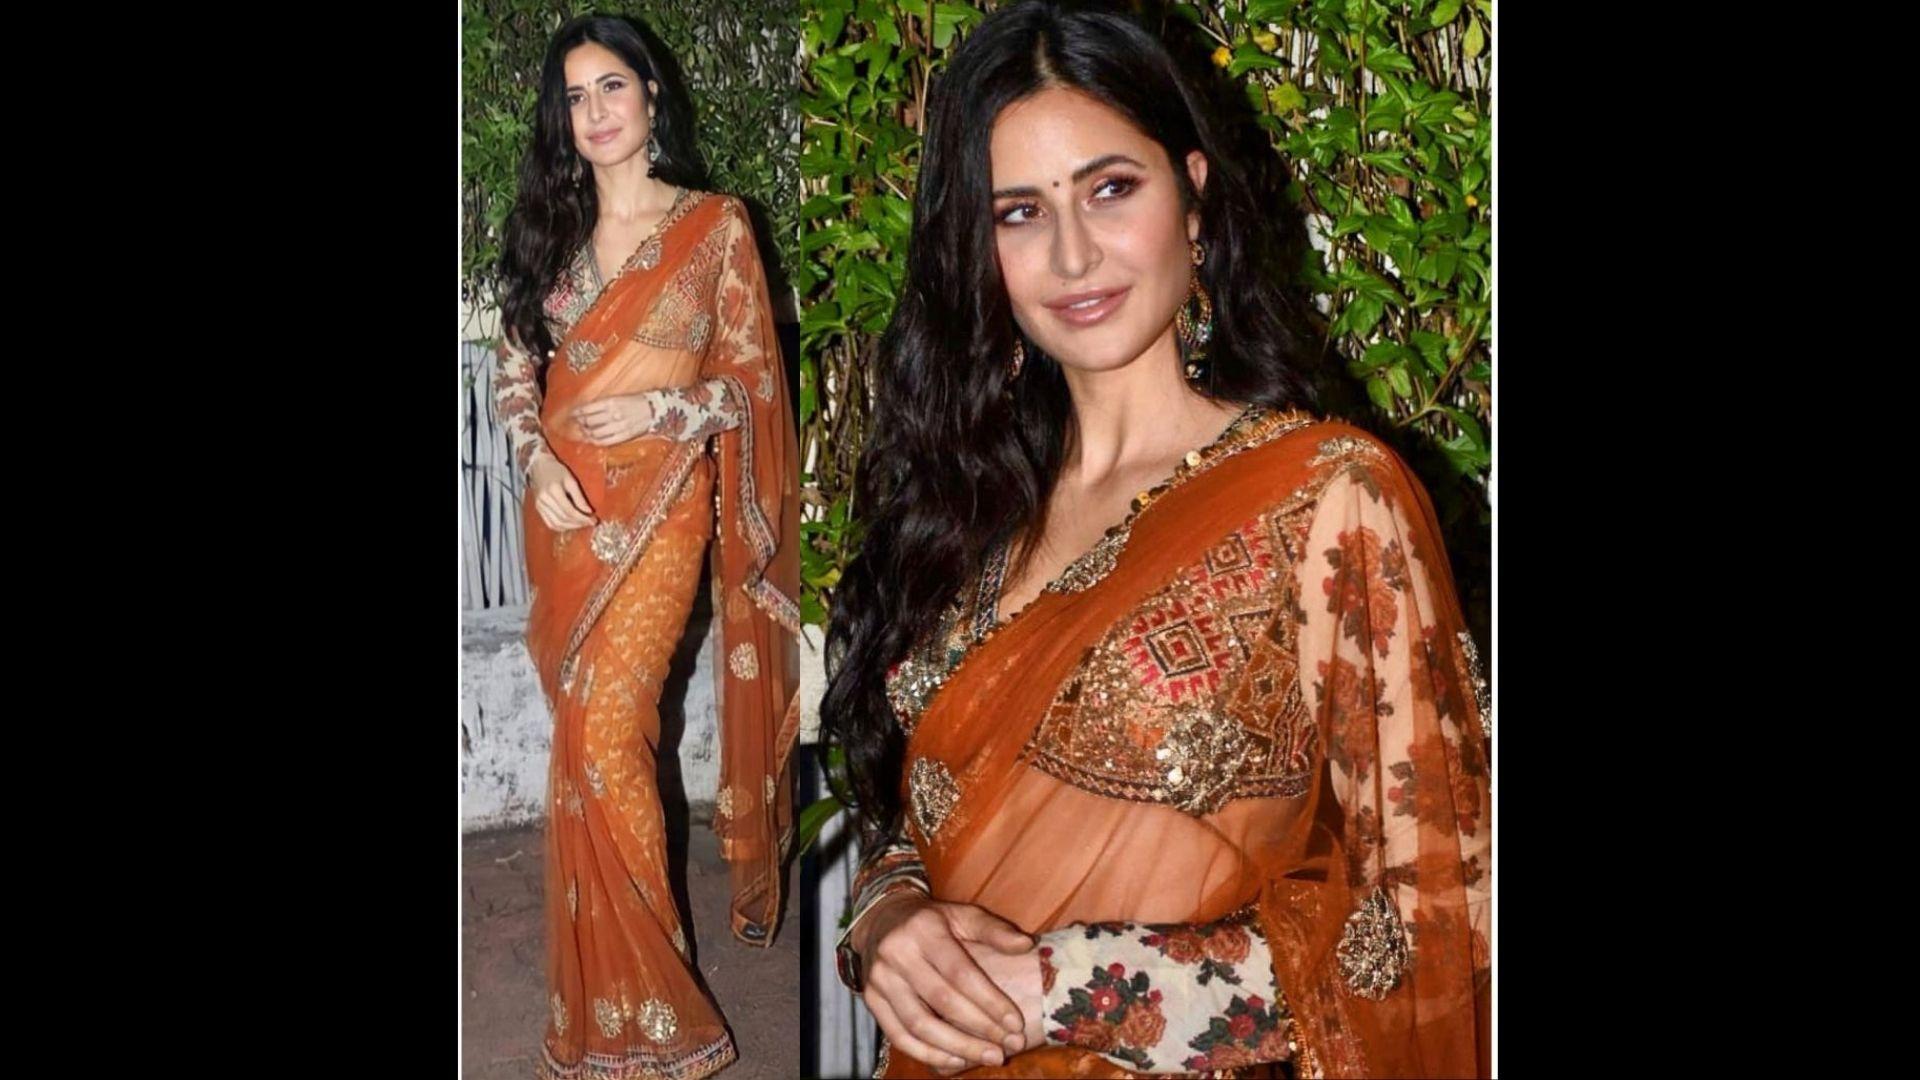 Sooryavanshi: Katrina Kaif Promotes Film In A Stunning Sabyasachi Saree; Her Look Will Give You Major Inspiration For Diwali – PICS INSIDE